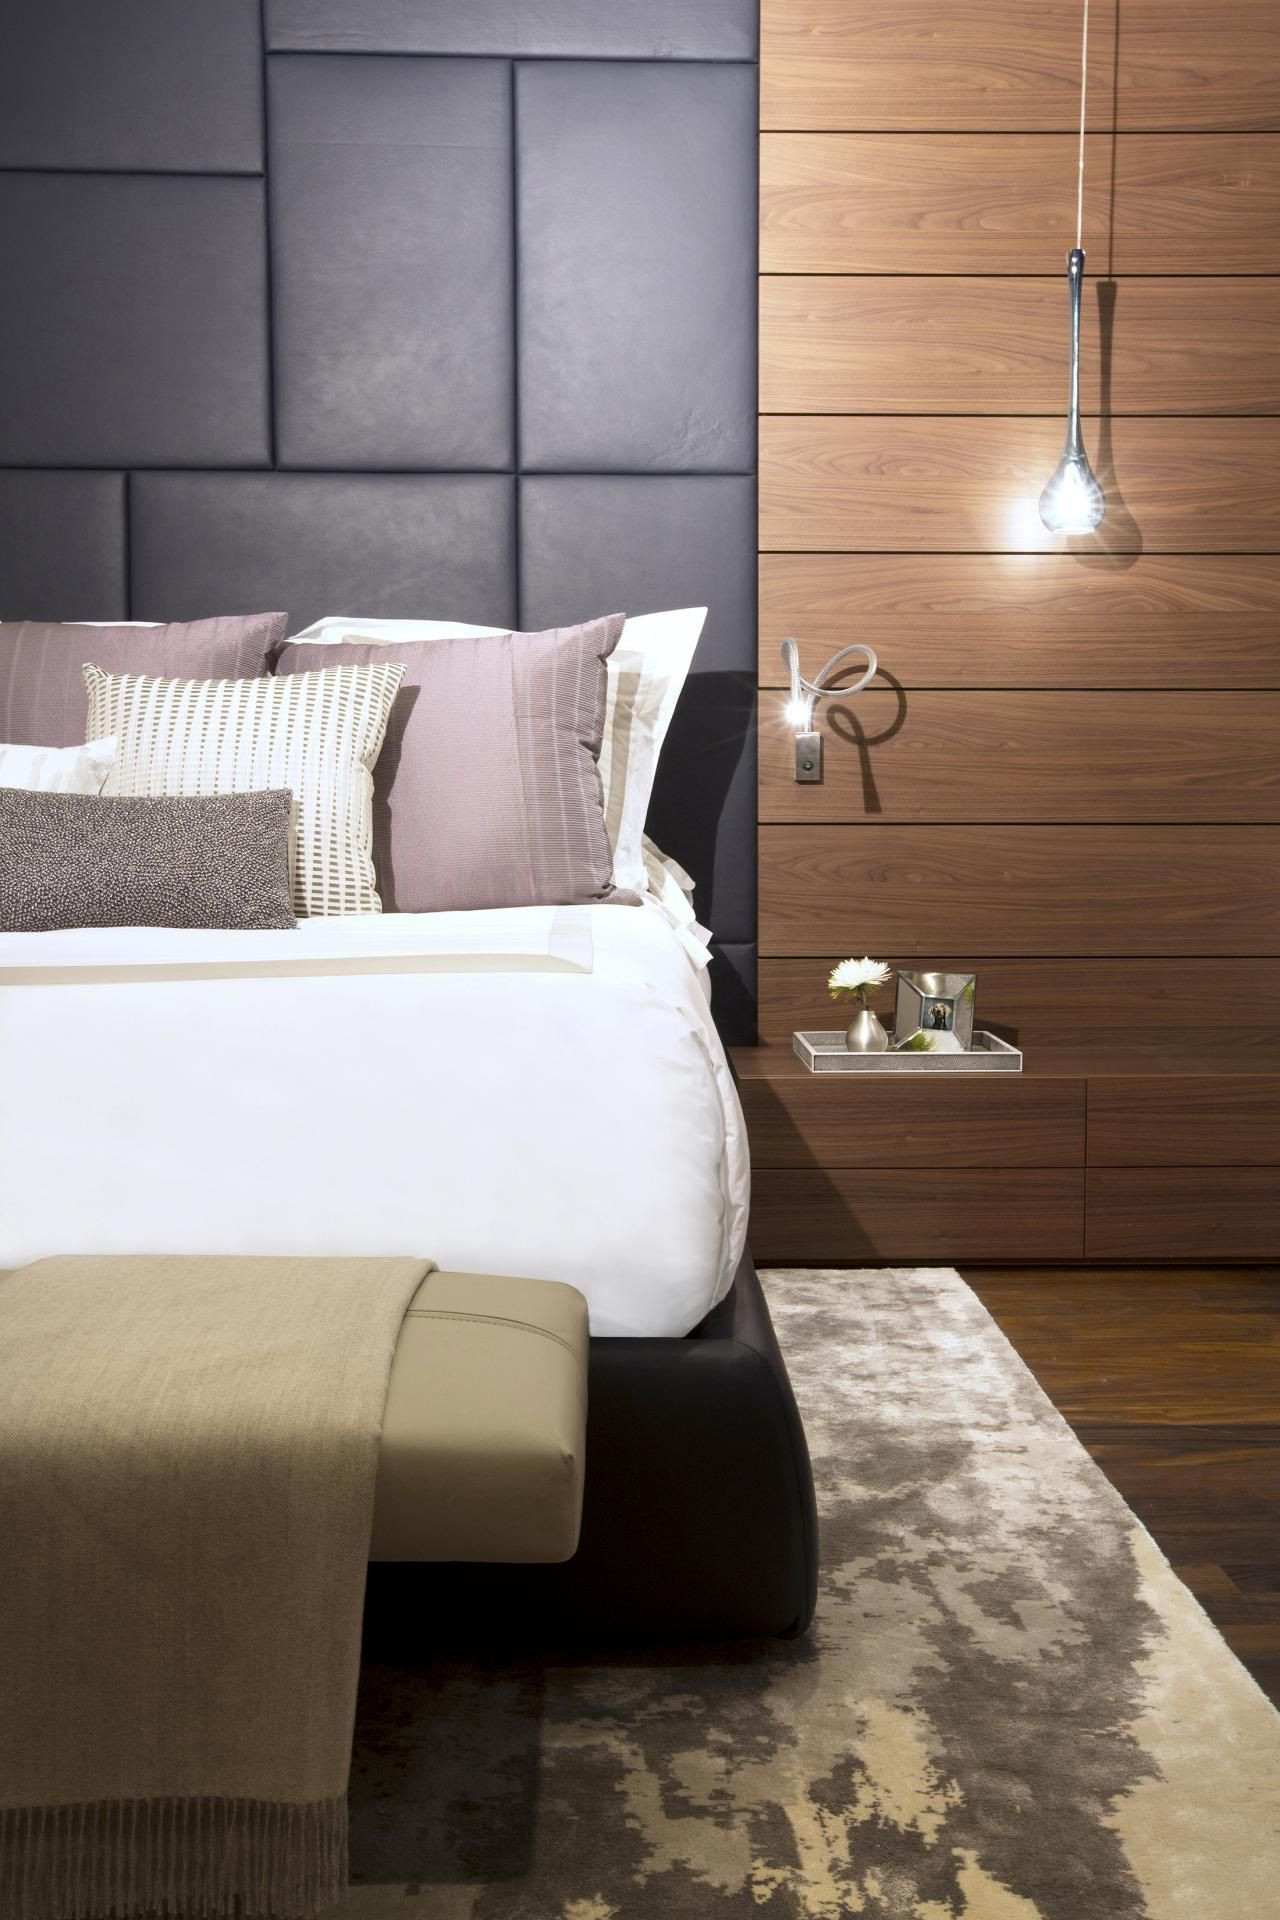 Master bedroom headboard design ideas  Rooms Viewer  HGTV  Home Decor  Pinterest  Hgtv Room and